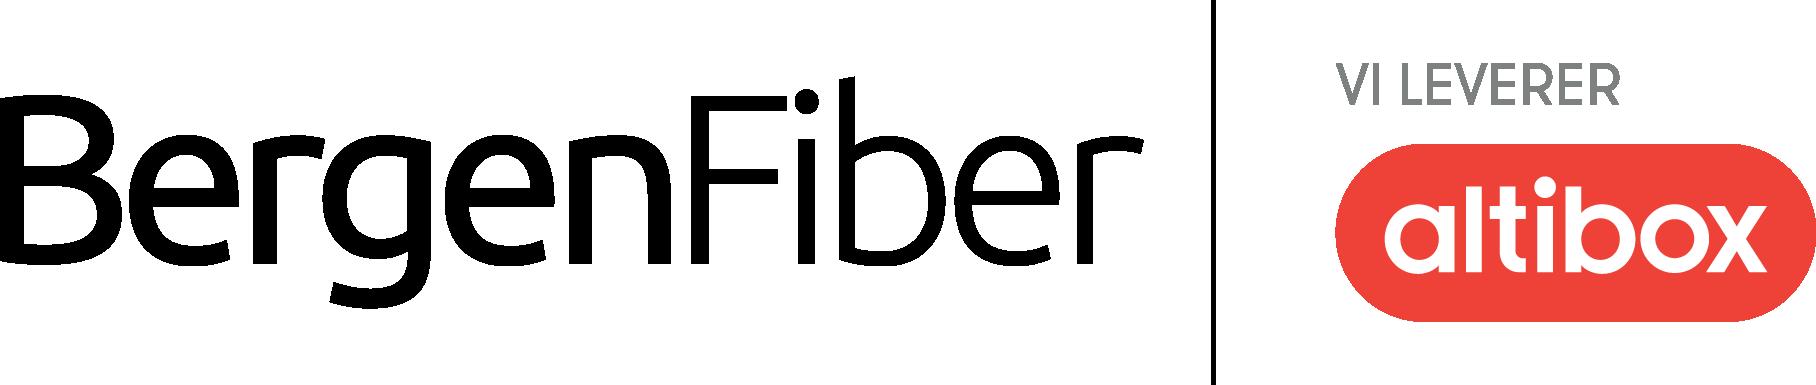 BergenFiber_partnerlogo-04